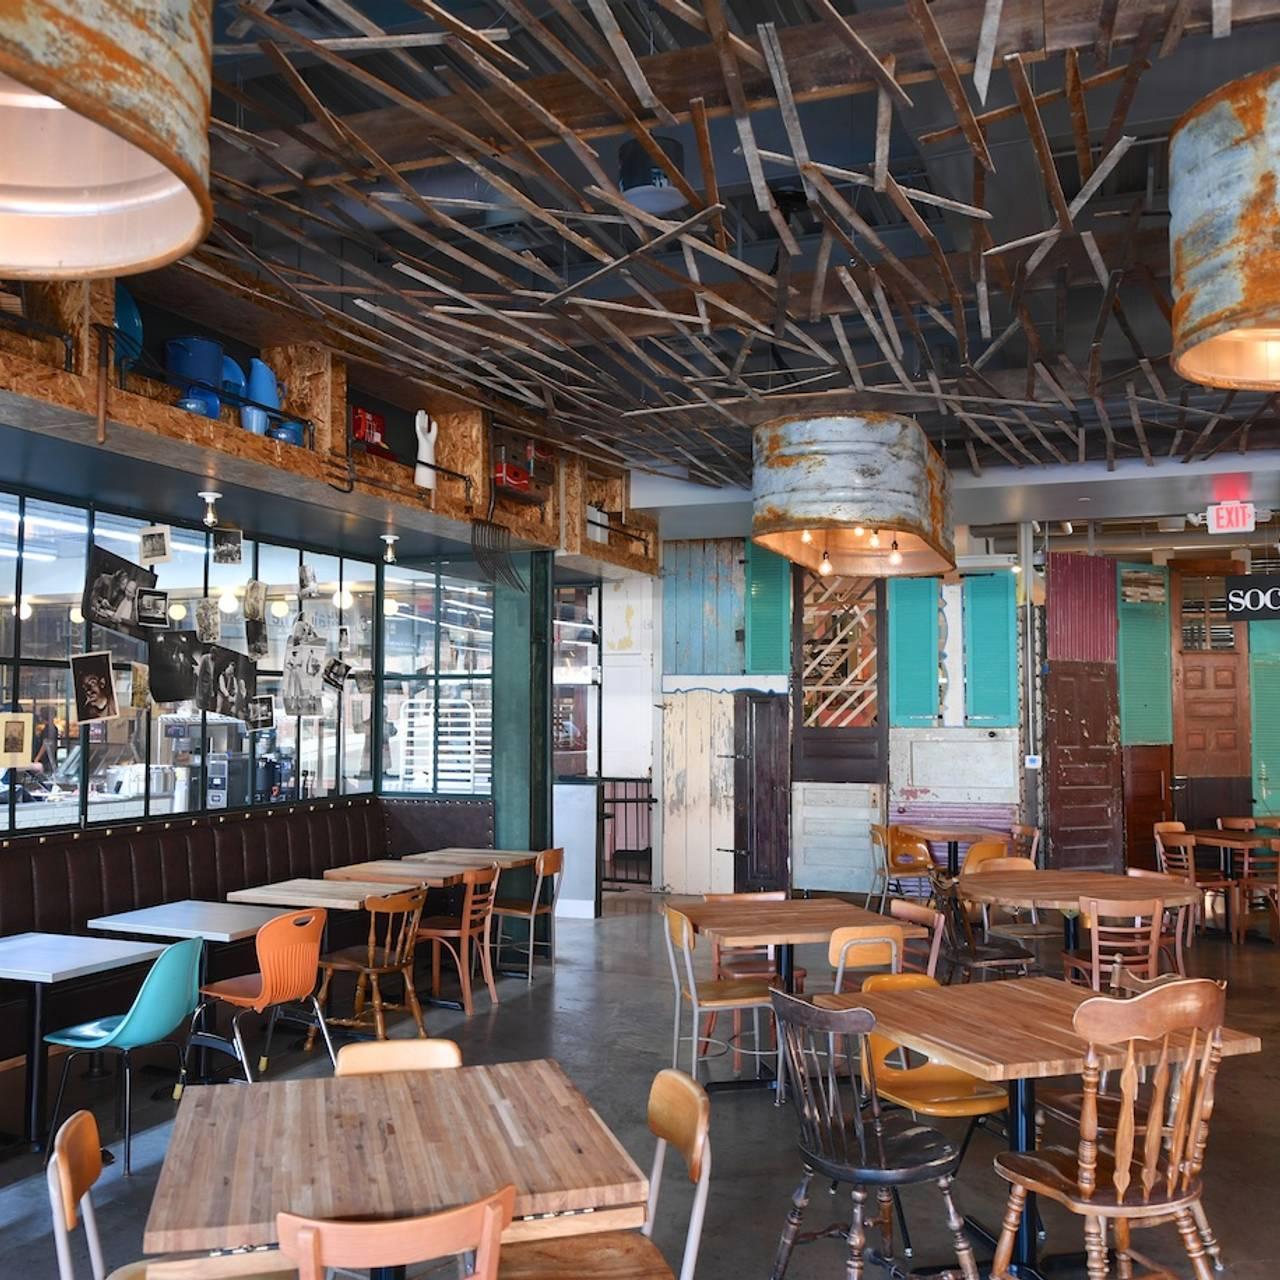 Social Kitchen And Bar Restaurant Birmingham Mi Opentable